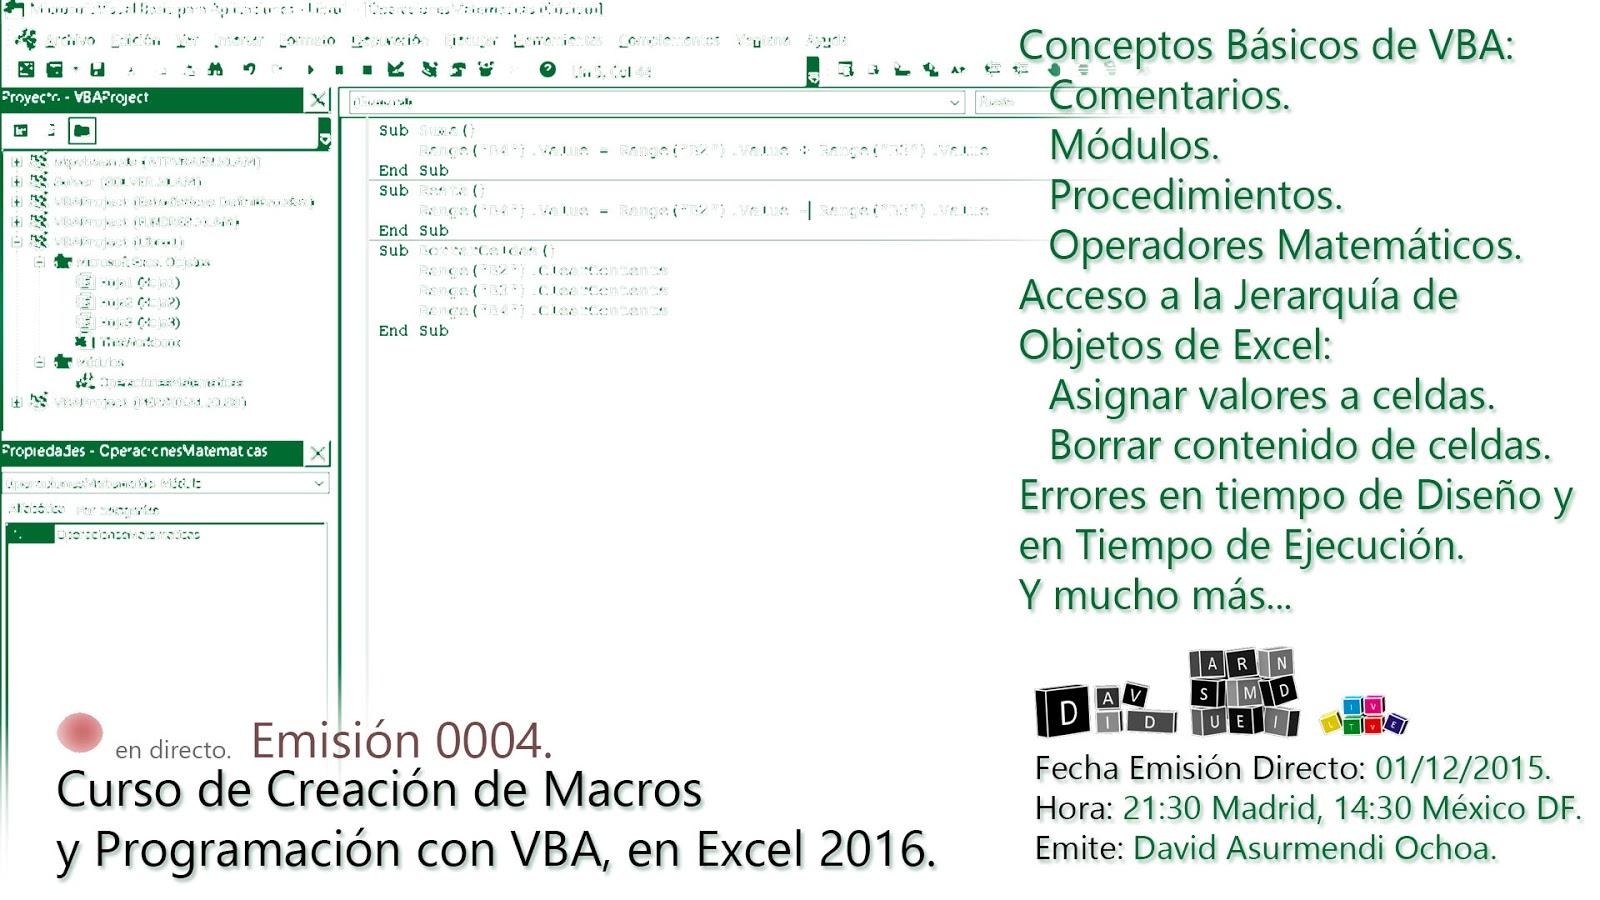 2015 rh davidasurmendi blogspot com curso basico vba pdf manual basico vba excel